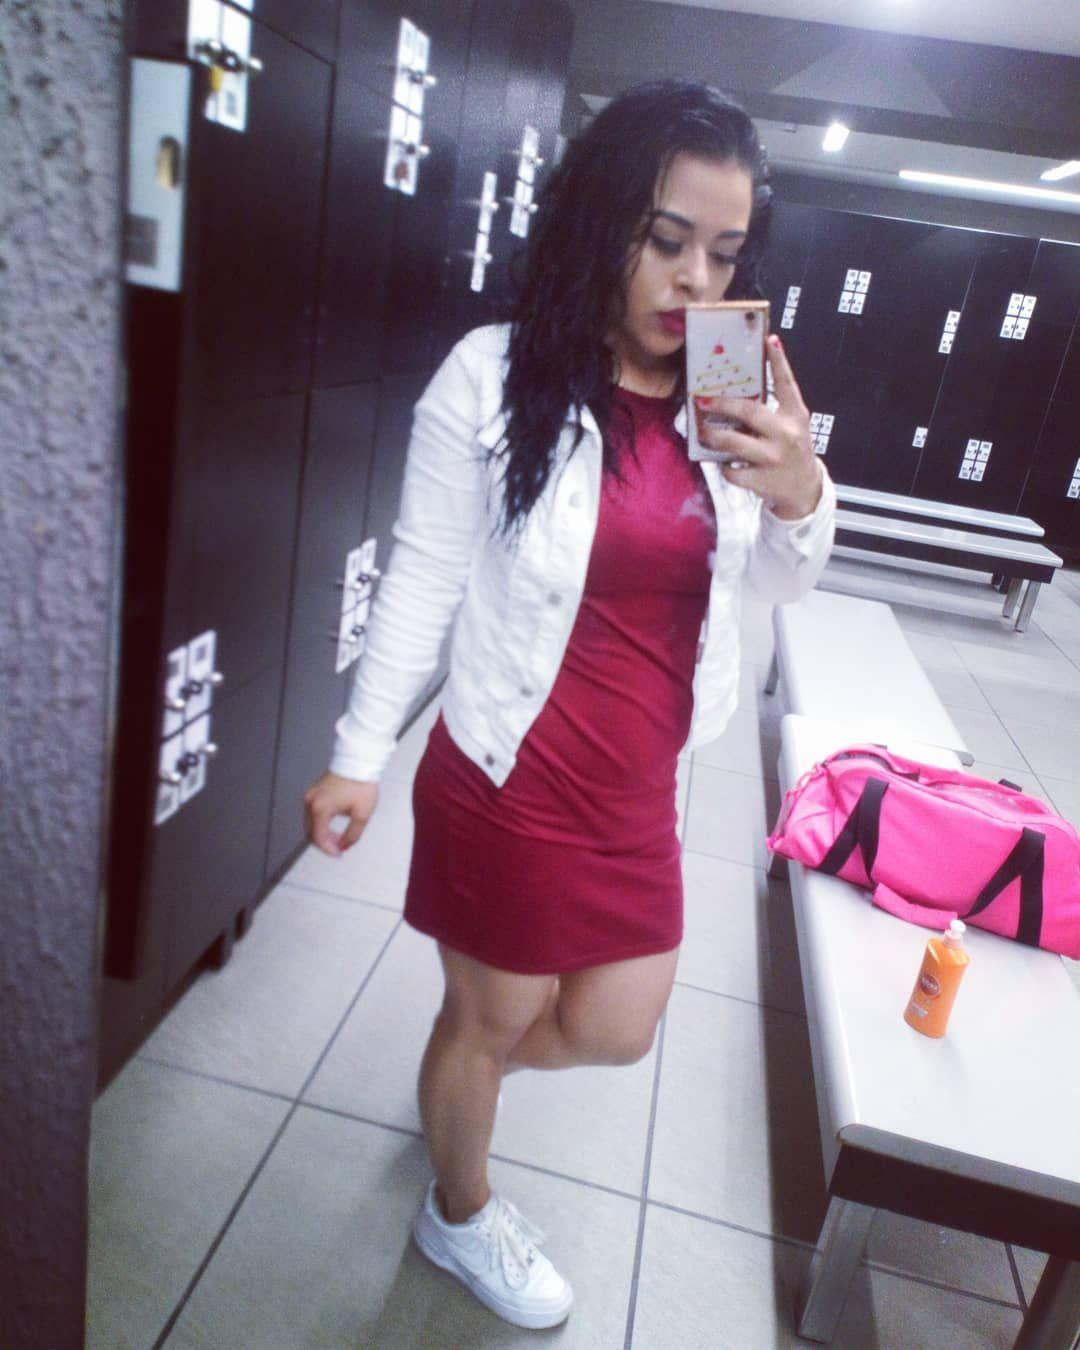 Hecho en México 💕 #love #amor #bonito #favorite #letras #poesia #accionpoetica #palabras #infinite #cdmx #sandy #women #daynew #sexy #kiss #beauty #beautygirl #women #pesas #seguridad #autoestima #smarfit #girlpower #gymlife #future #perserverancia #metas #goals